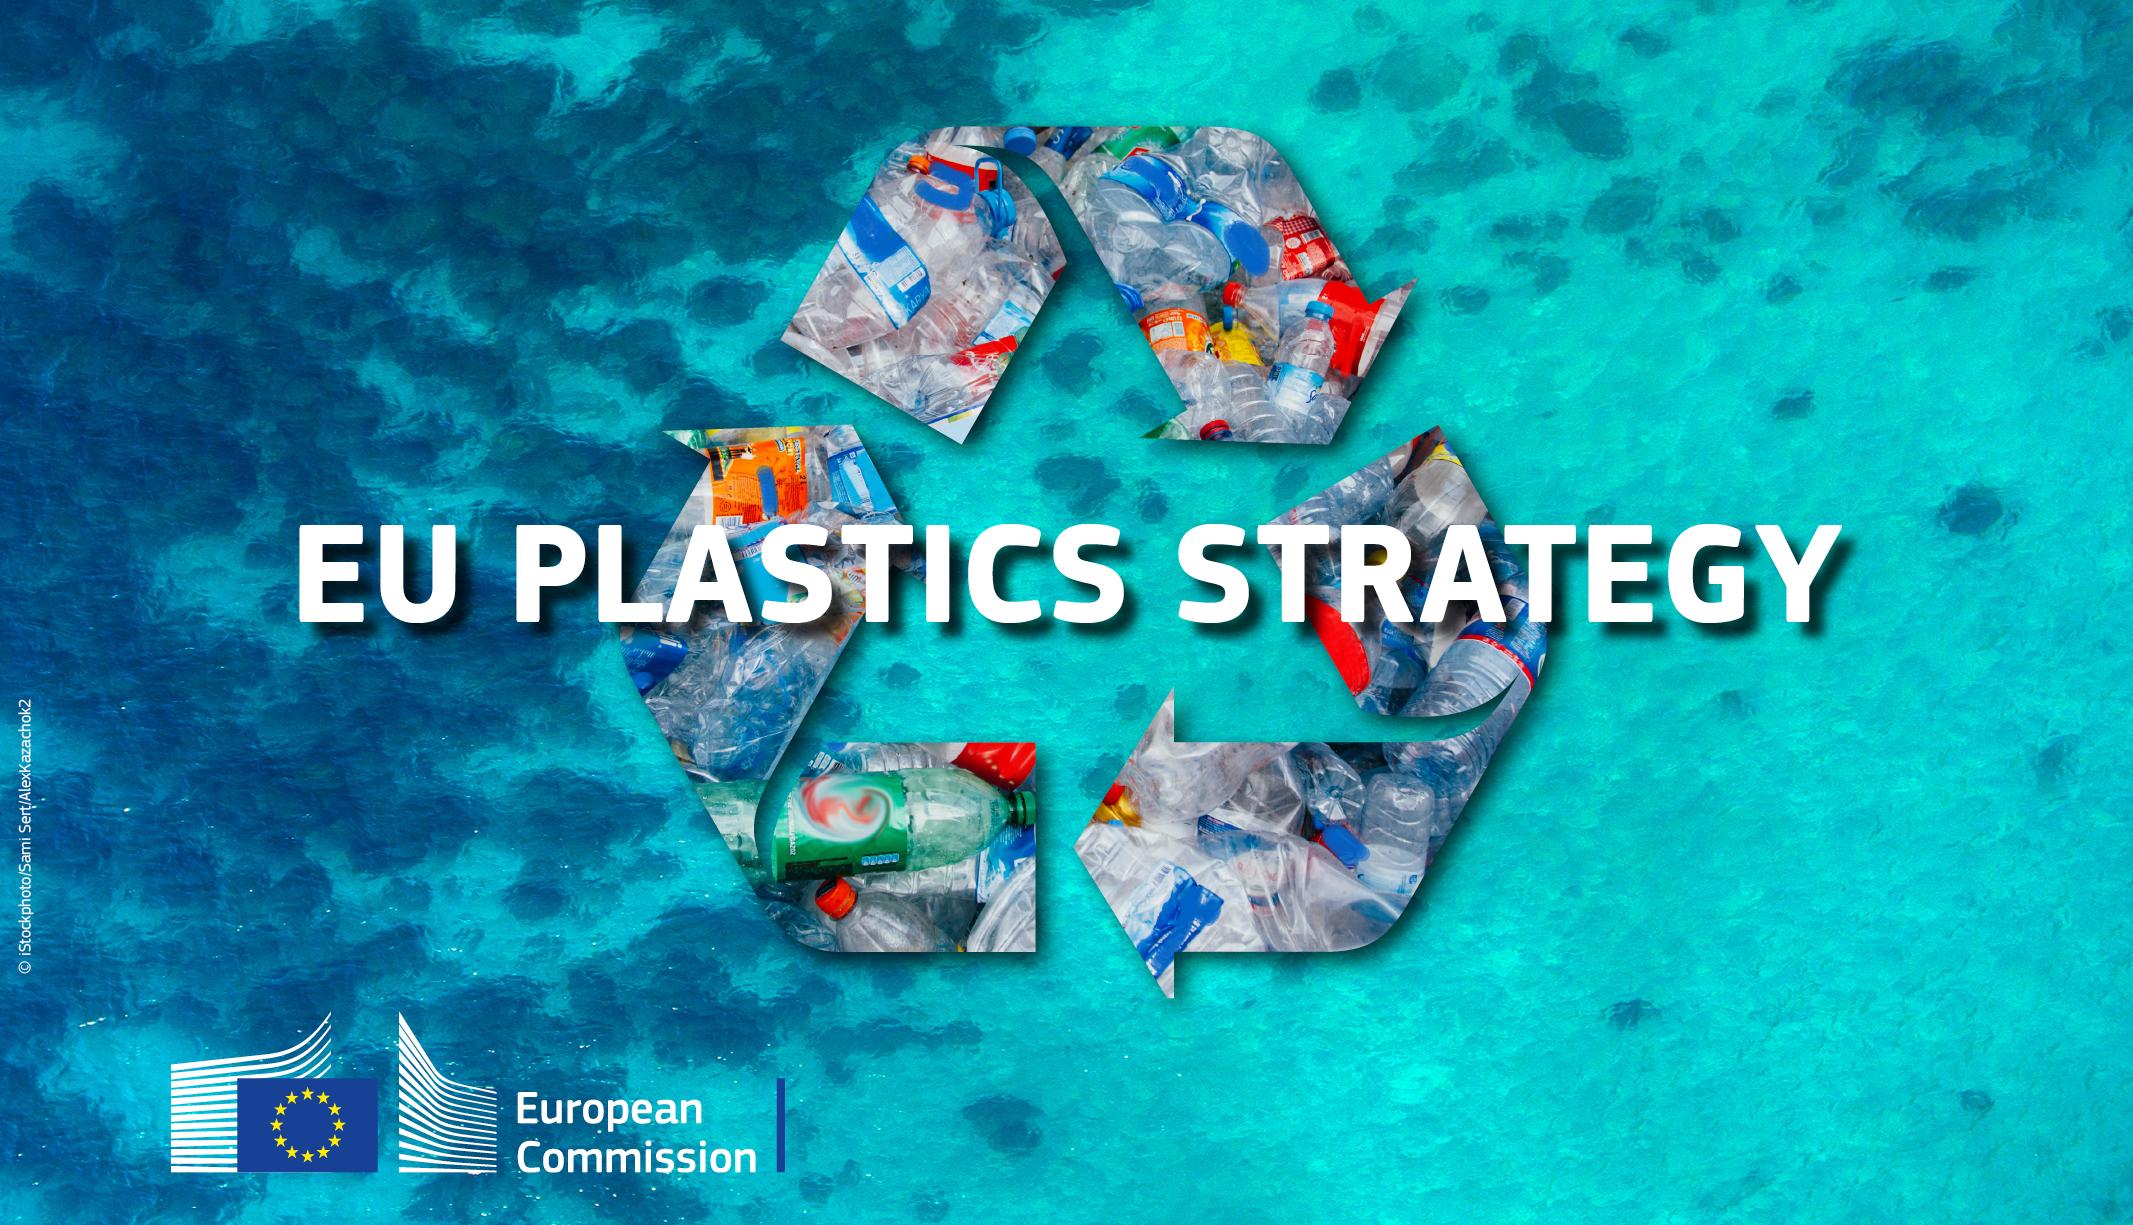 plasticstrategyvisual.jpg